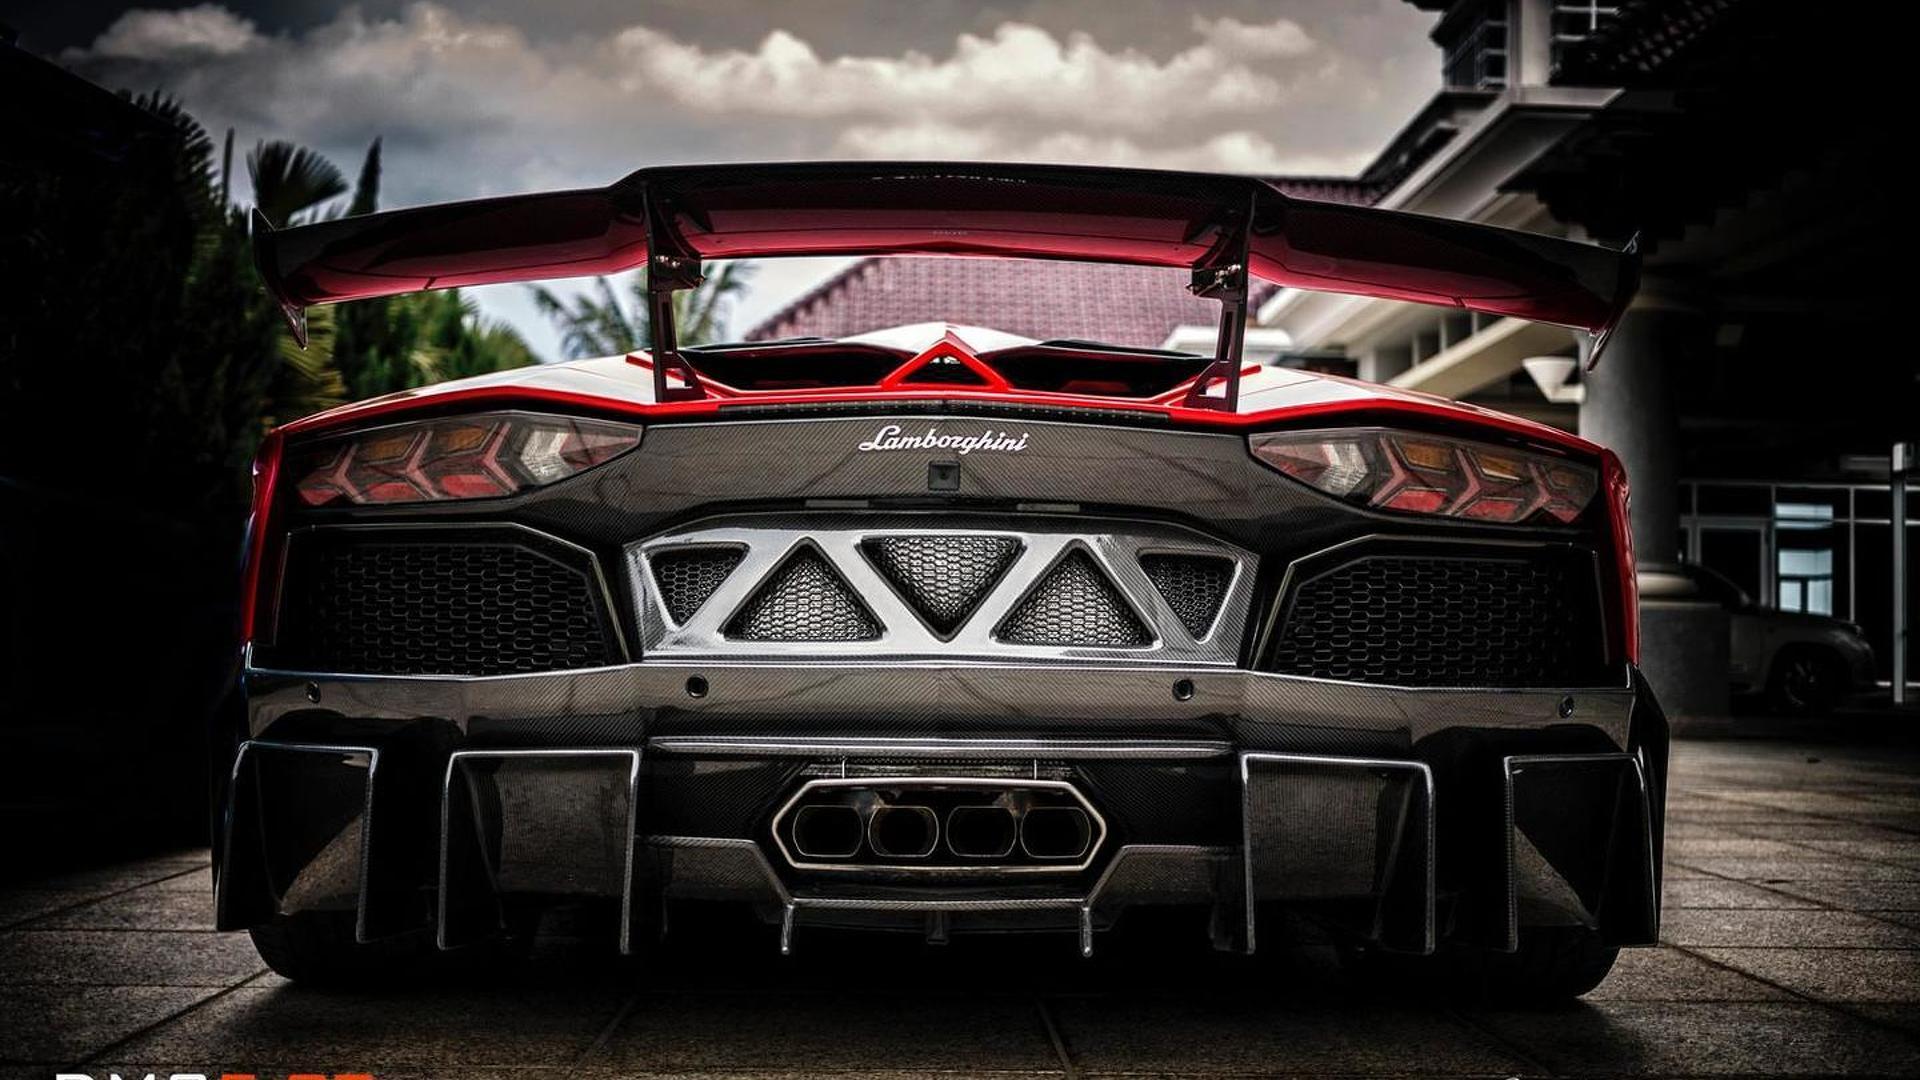 Lamborghini Aventador LP988 Edizione GT fully revealed by DMC